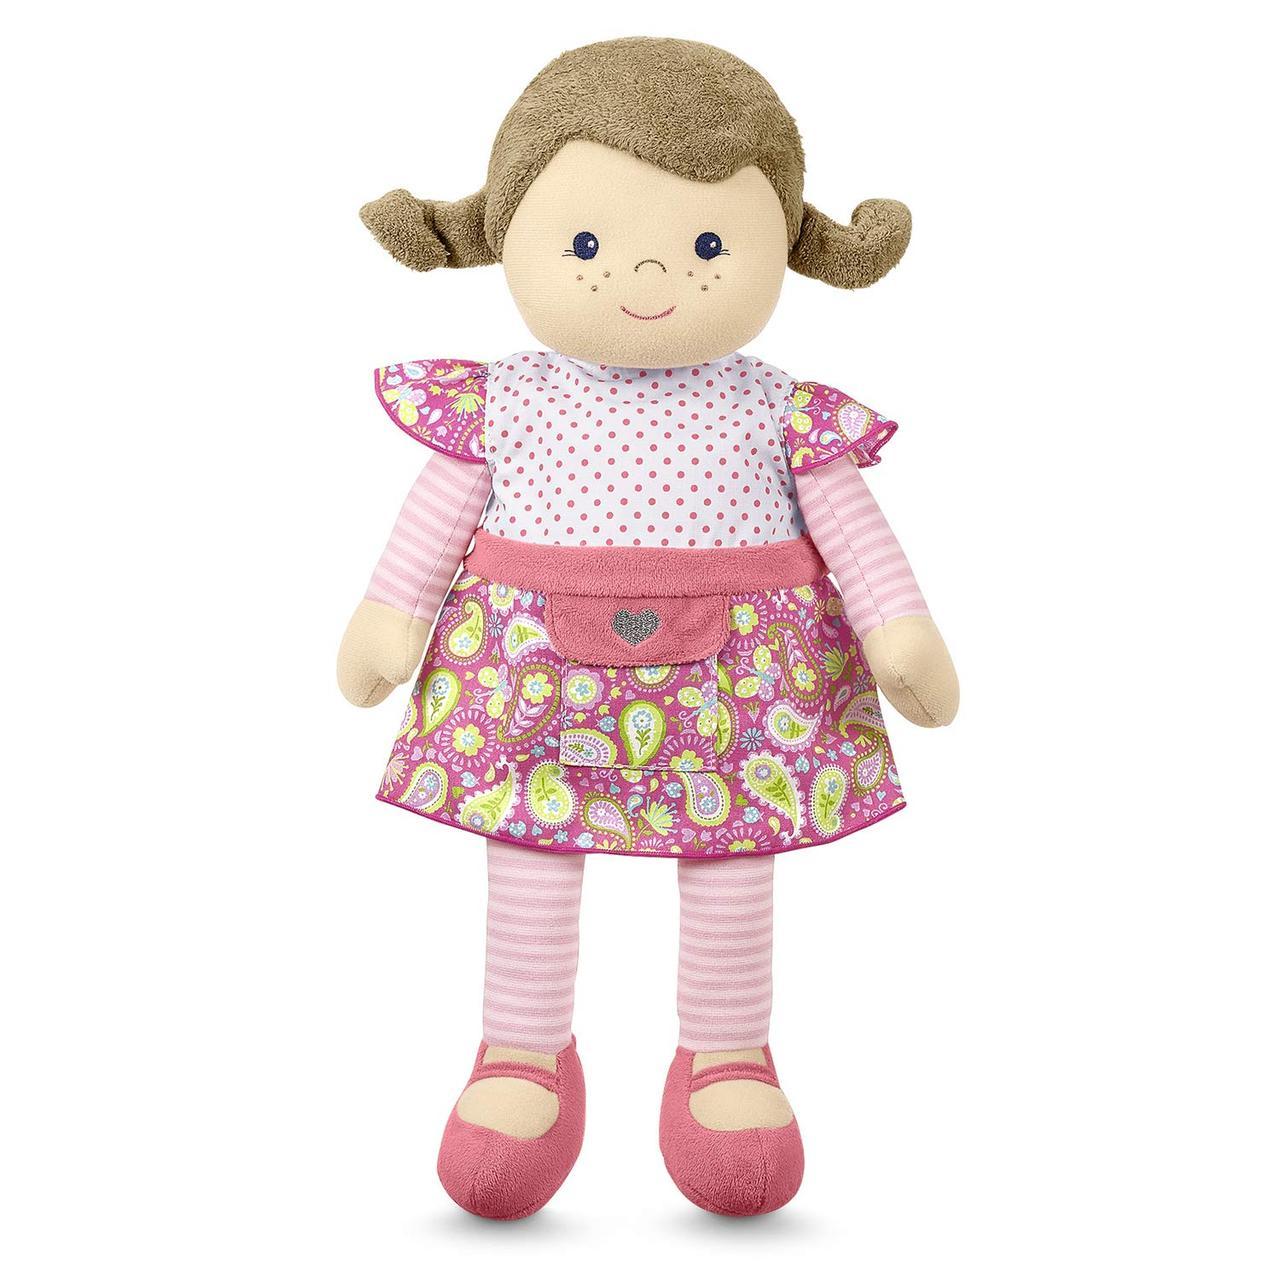 М'яка набивна лялька Sterntaler®  - Gesa 41 см